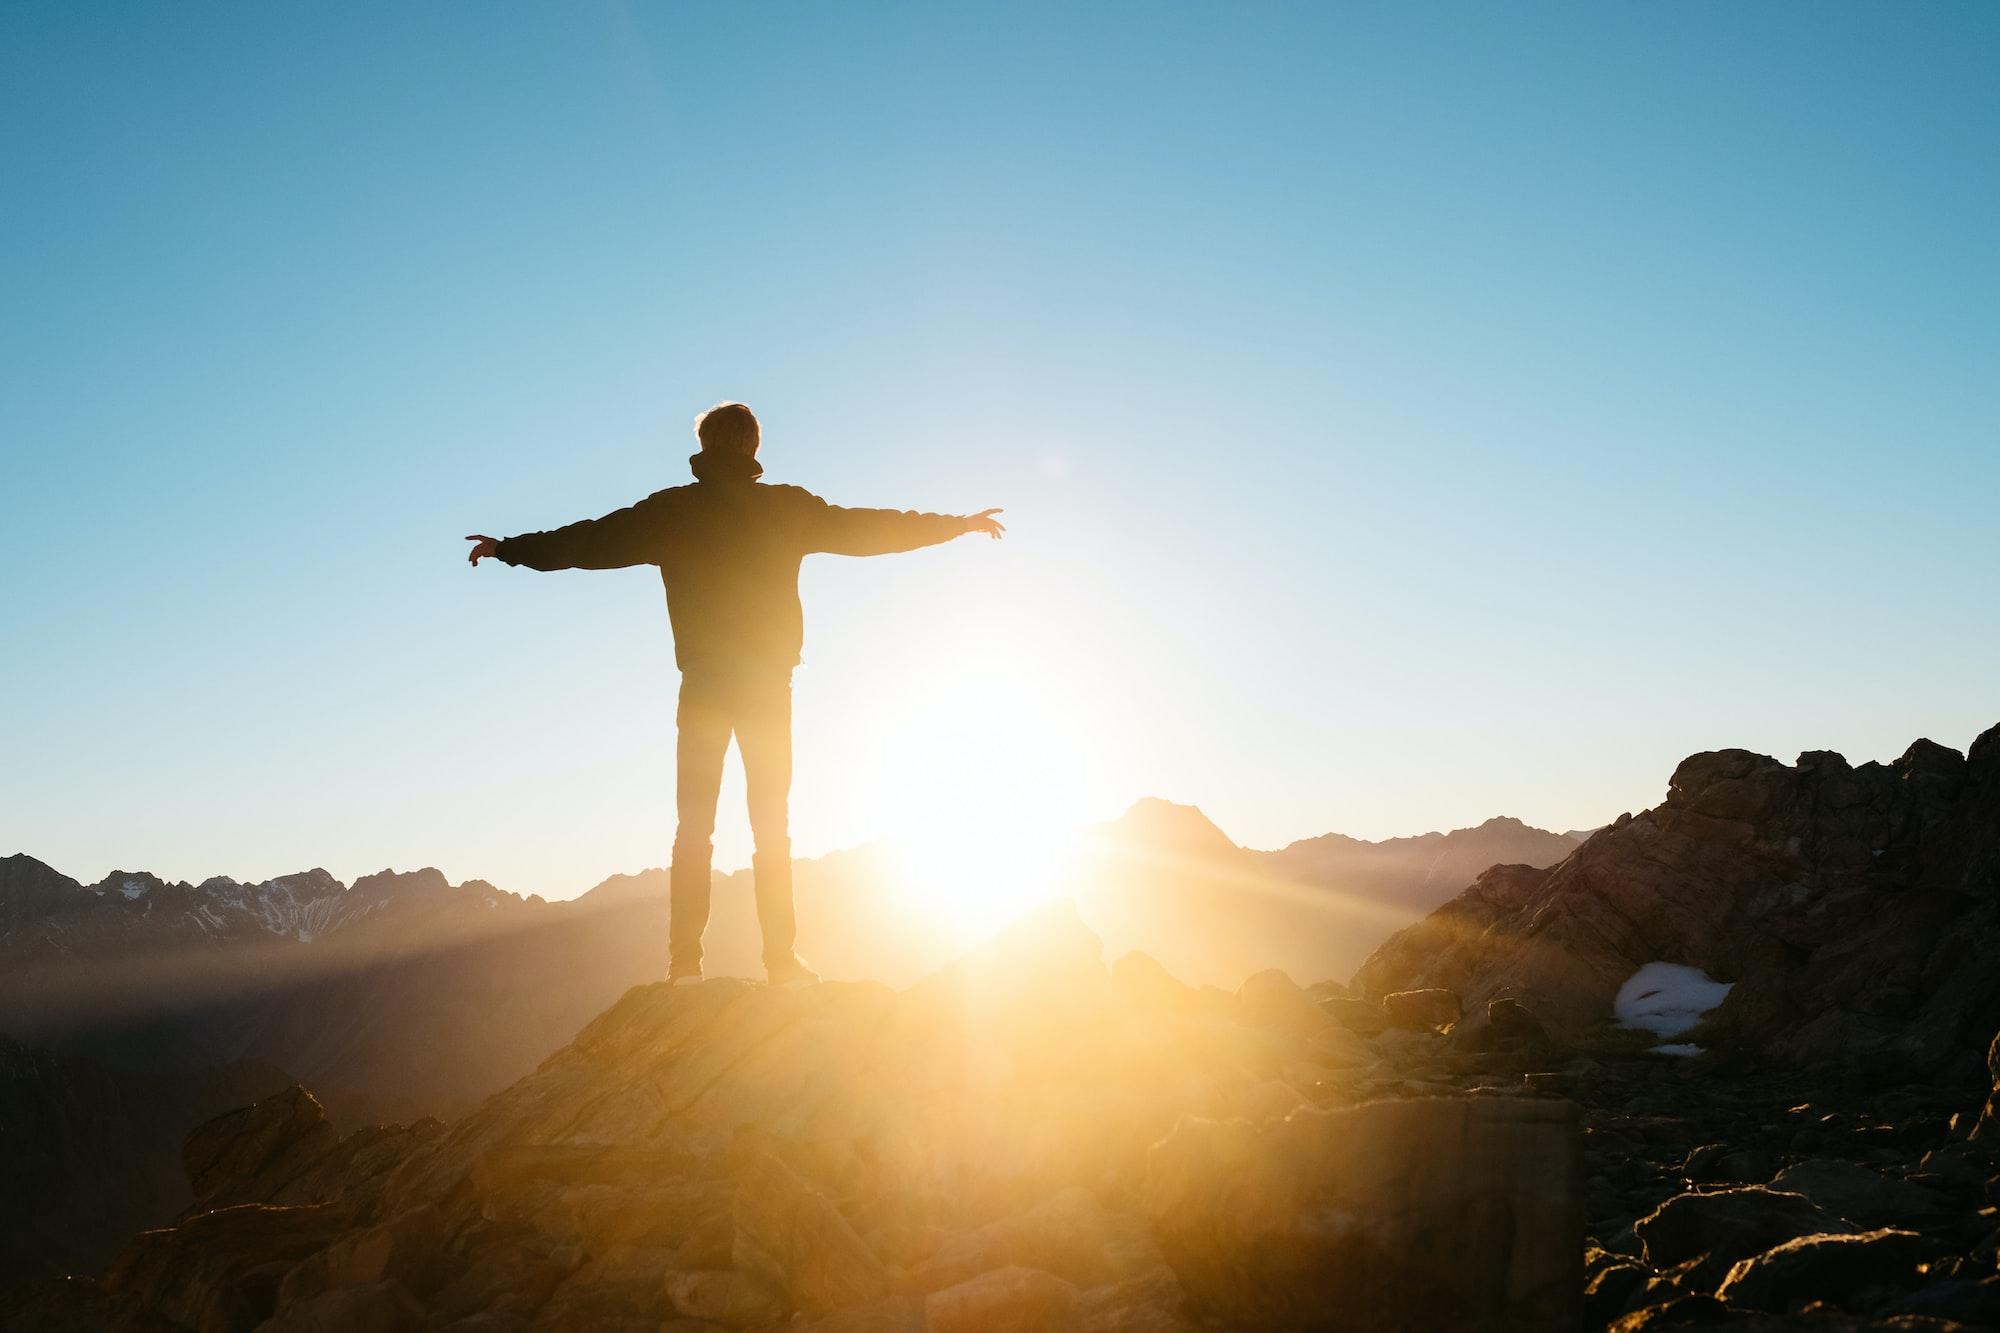 Gratitude Stories: Rekindled Hope